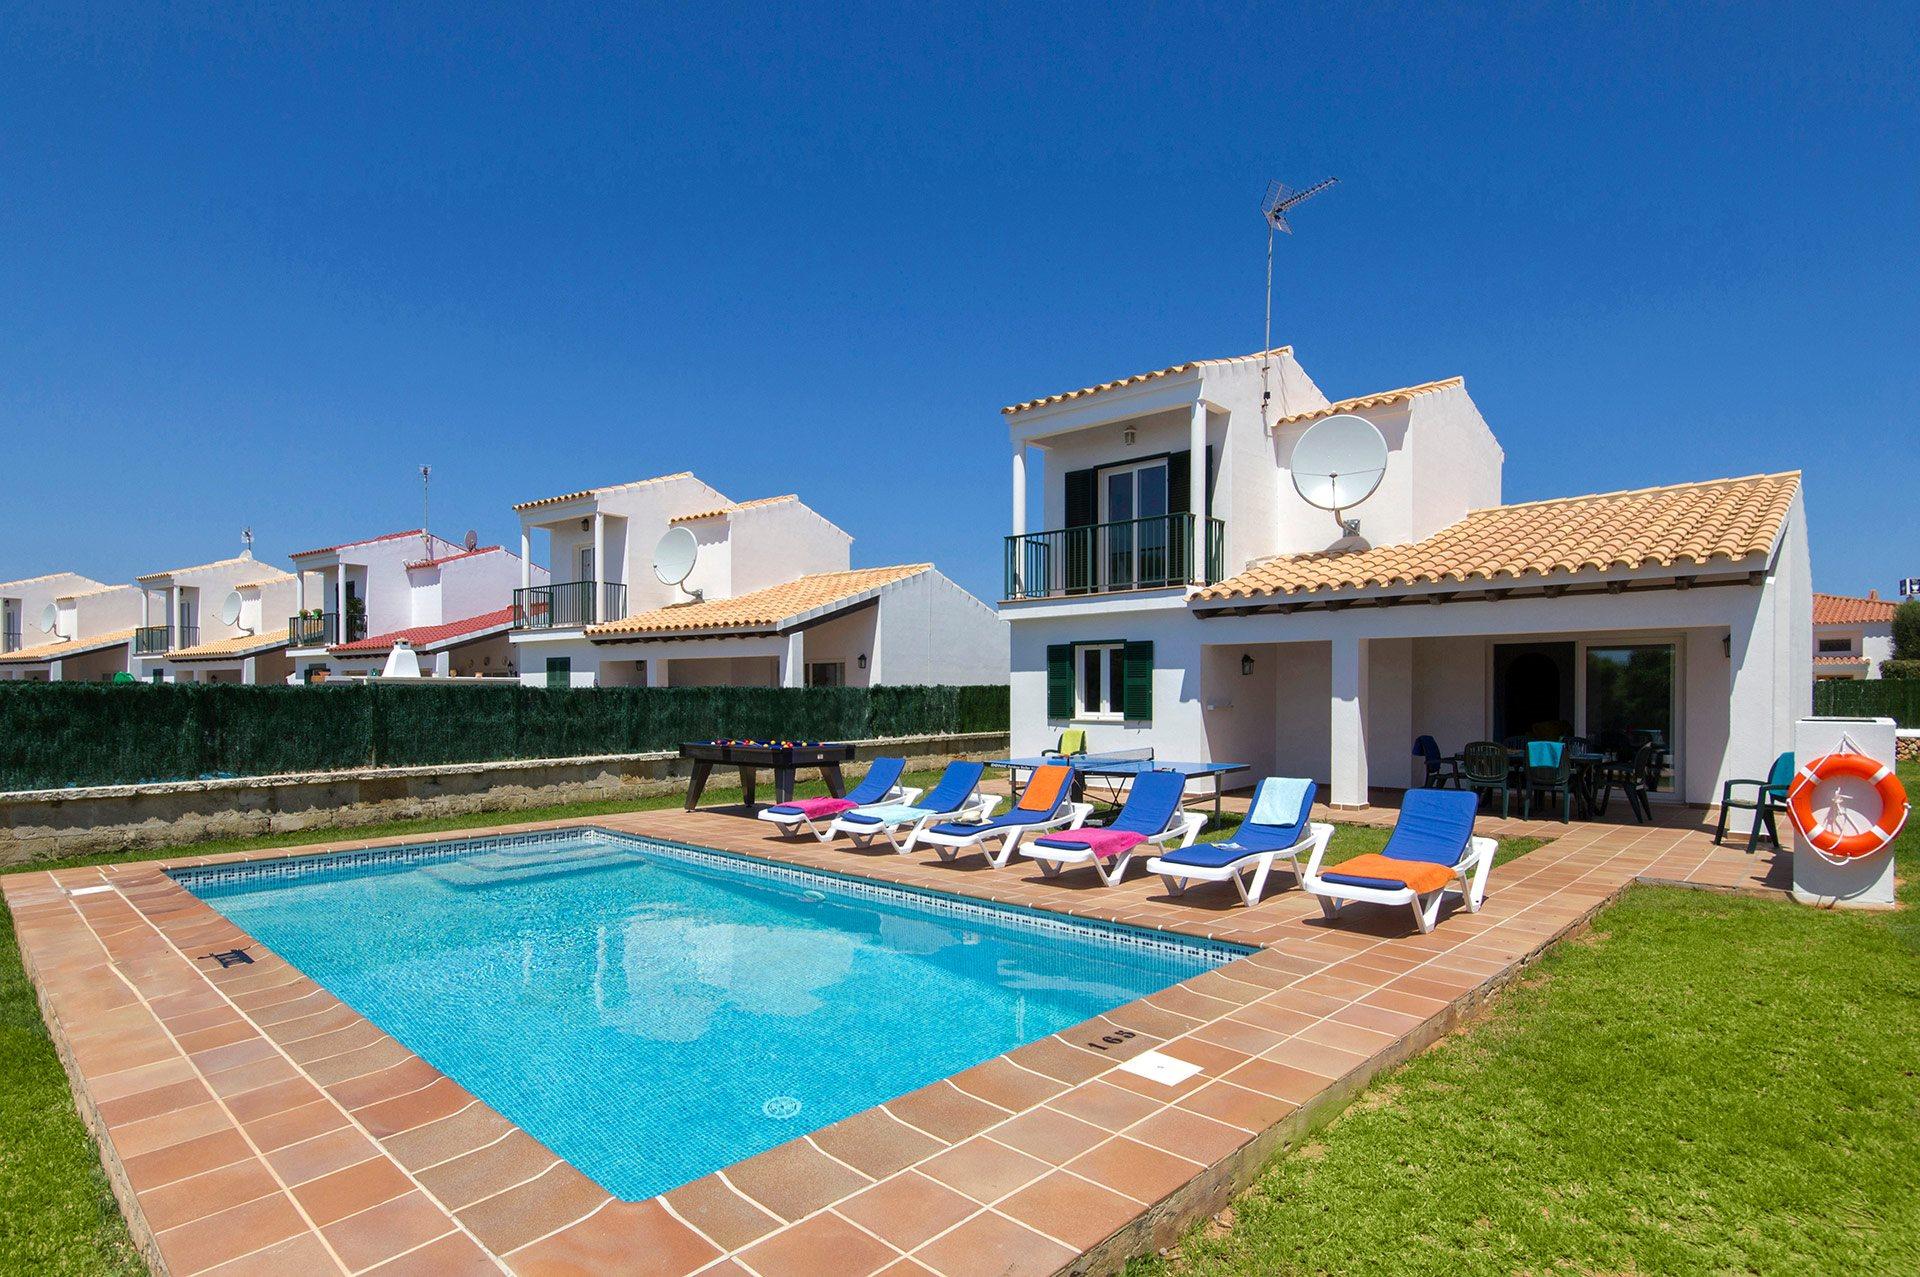 Villa Vientosol, Calan Forcat, Menorca, Spain